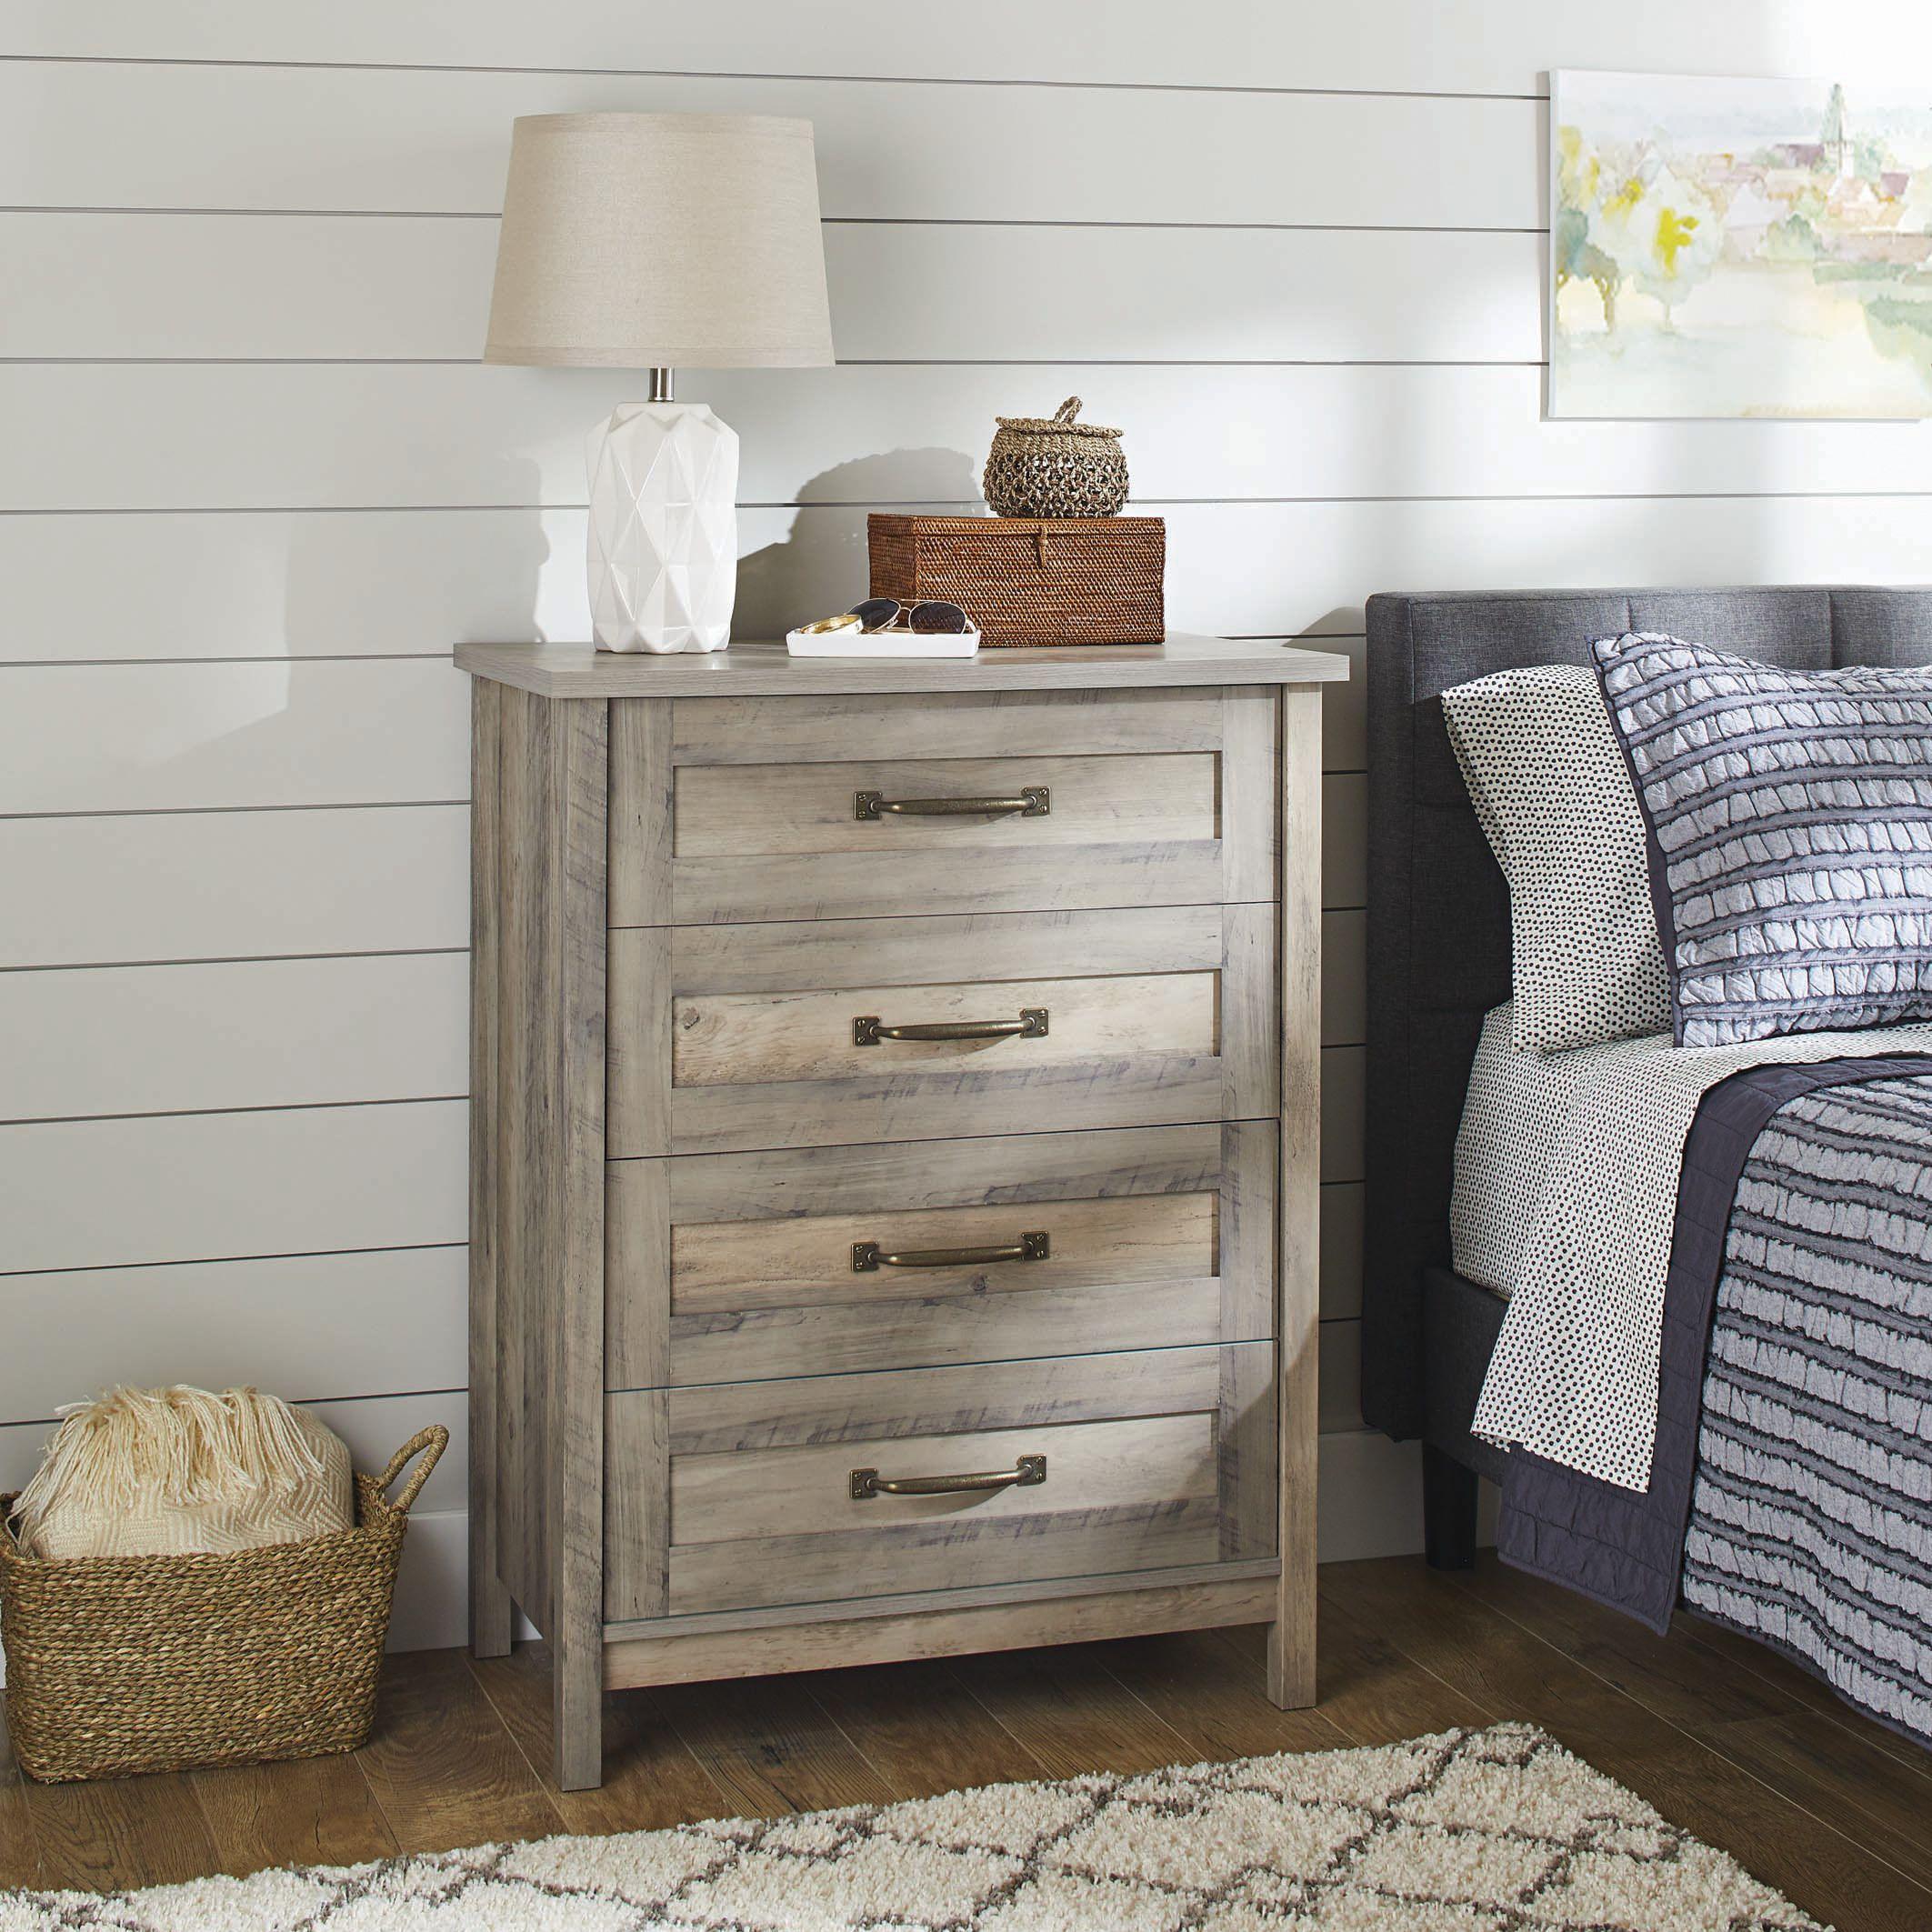 Better Homes Gardens Modern Farmhouse 4 Drawer Chest Rustic Gray Finish Walmart Com Wooden Bedroom Rustic Dresser Bedroom Furniture [ 2125 x 2125 Pixel ]